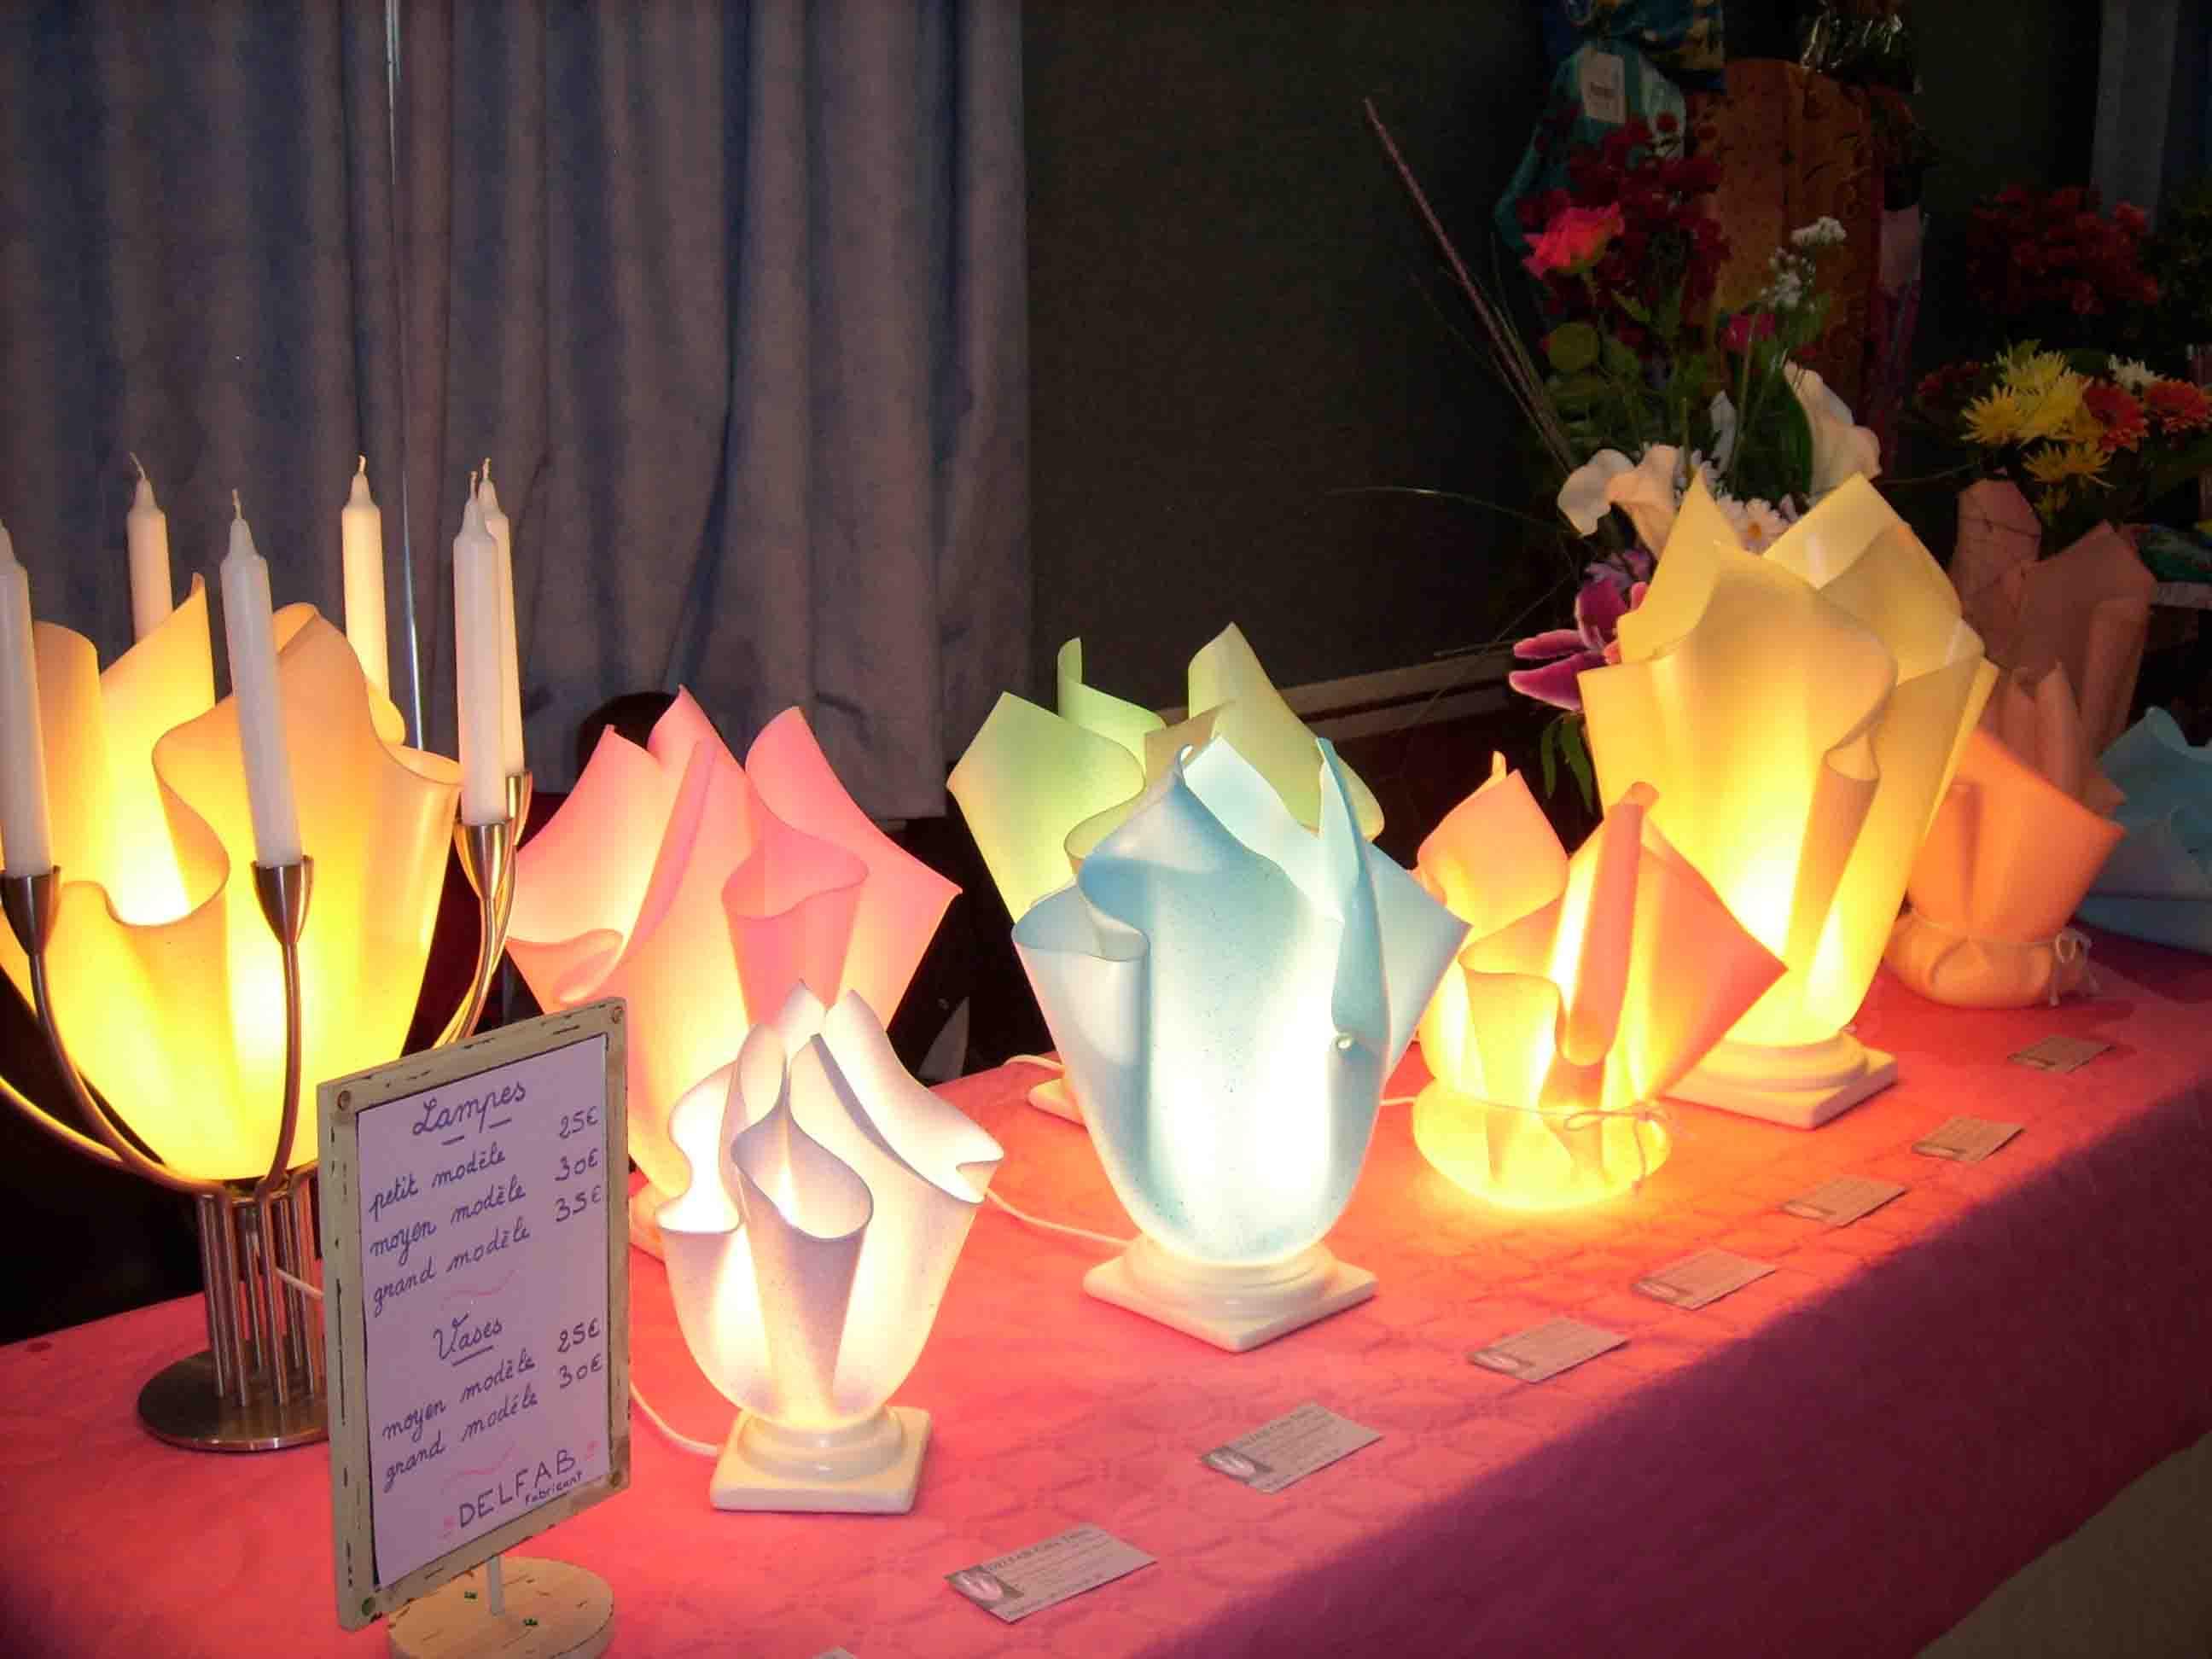 lampe artisanale lampe d corative diffuseur huiles. Black Bedroom Furniture Sets. Home Design Ideas